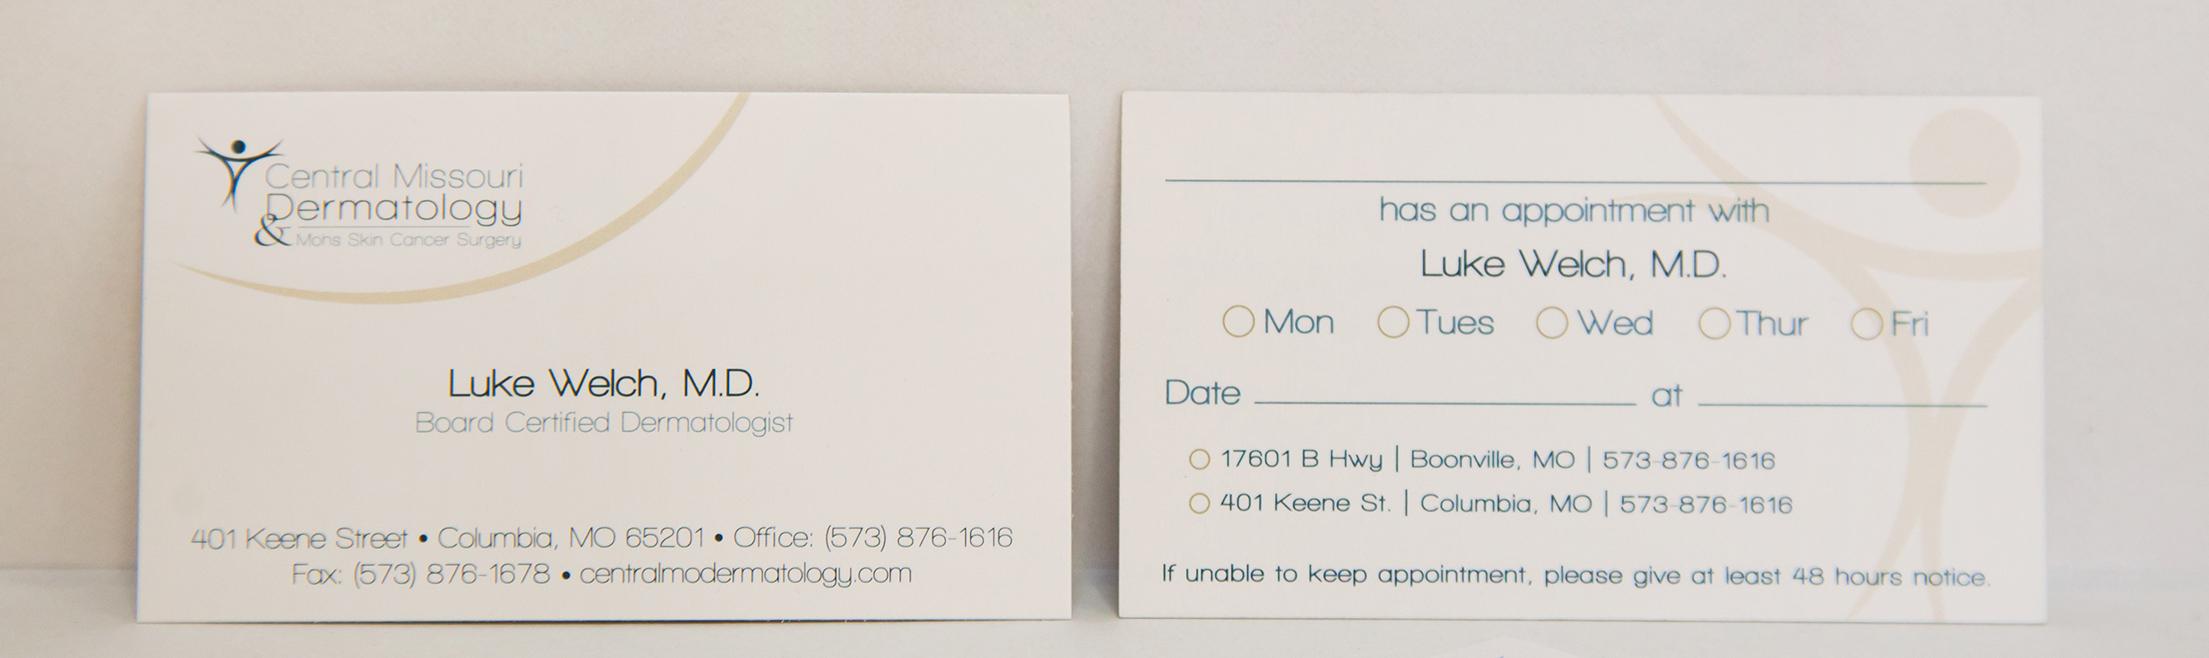 Central Missouri Dermatology Business Cards